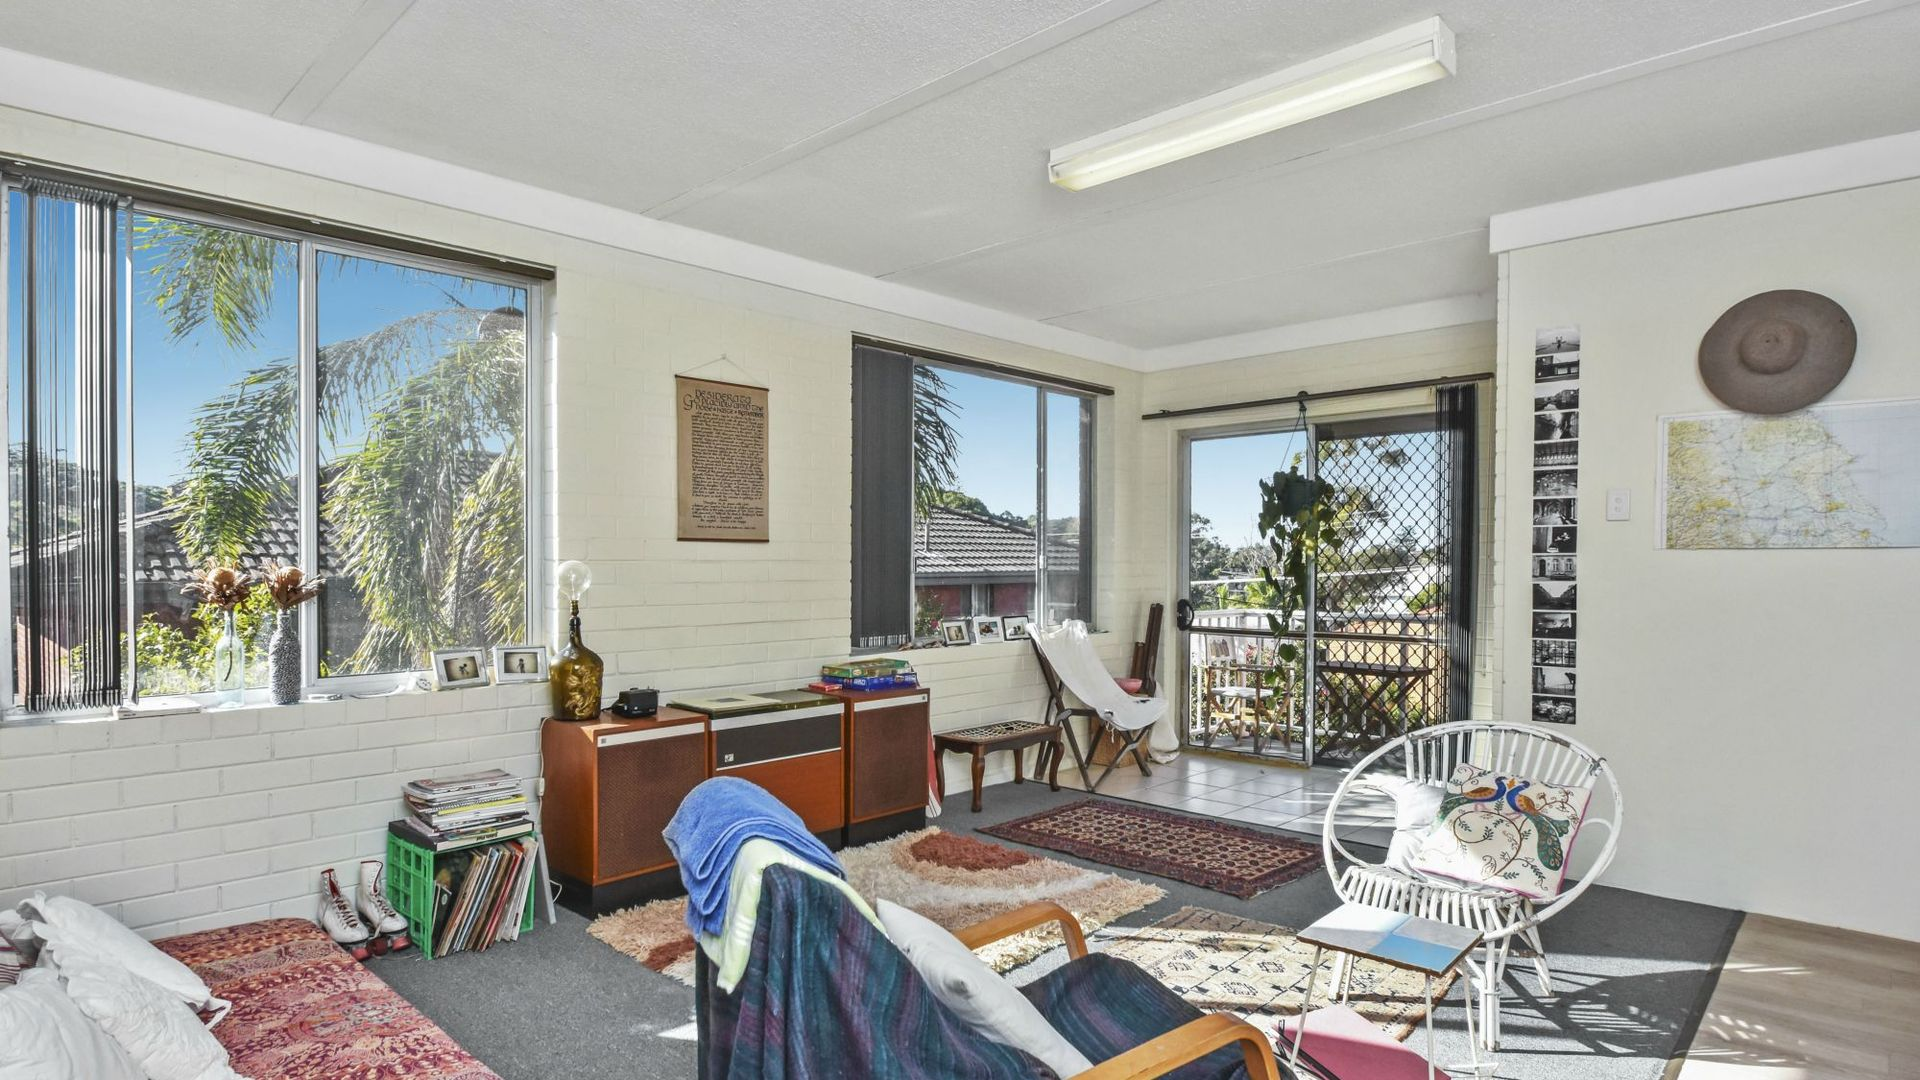 6/55 Chalmers Street, Port Macquarie NSW 2444, Image 1